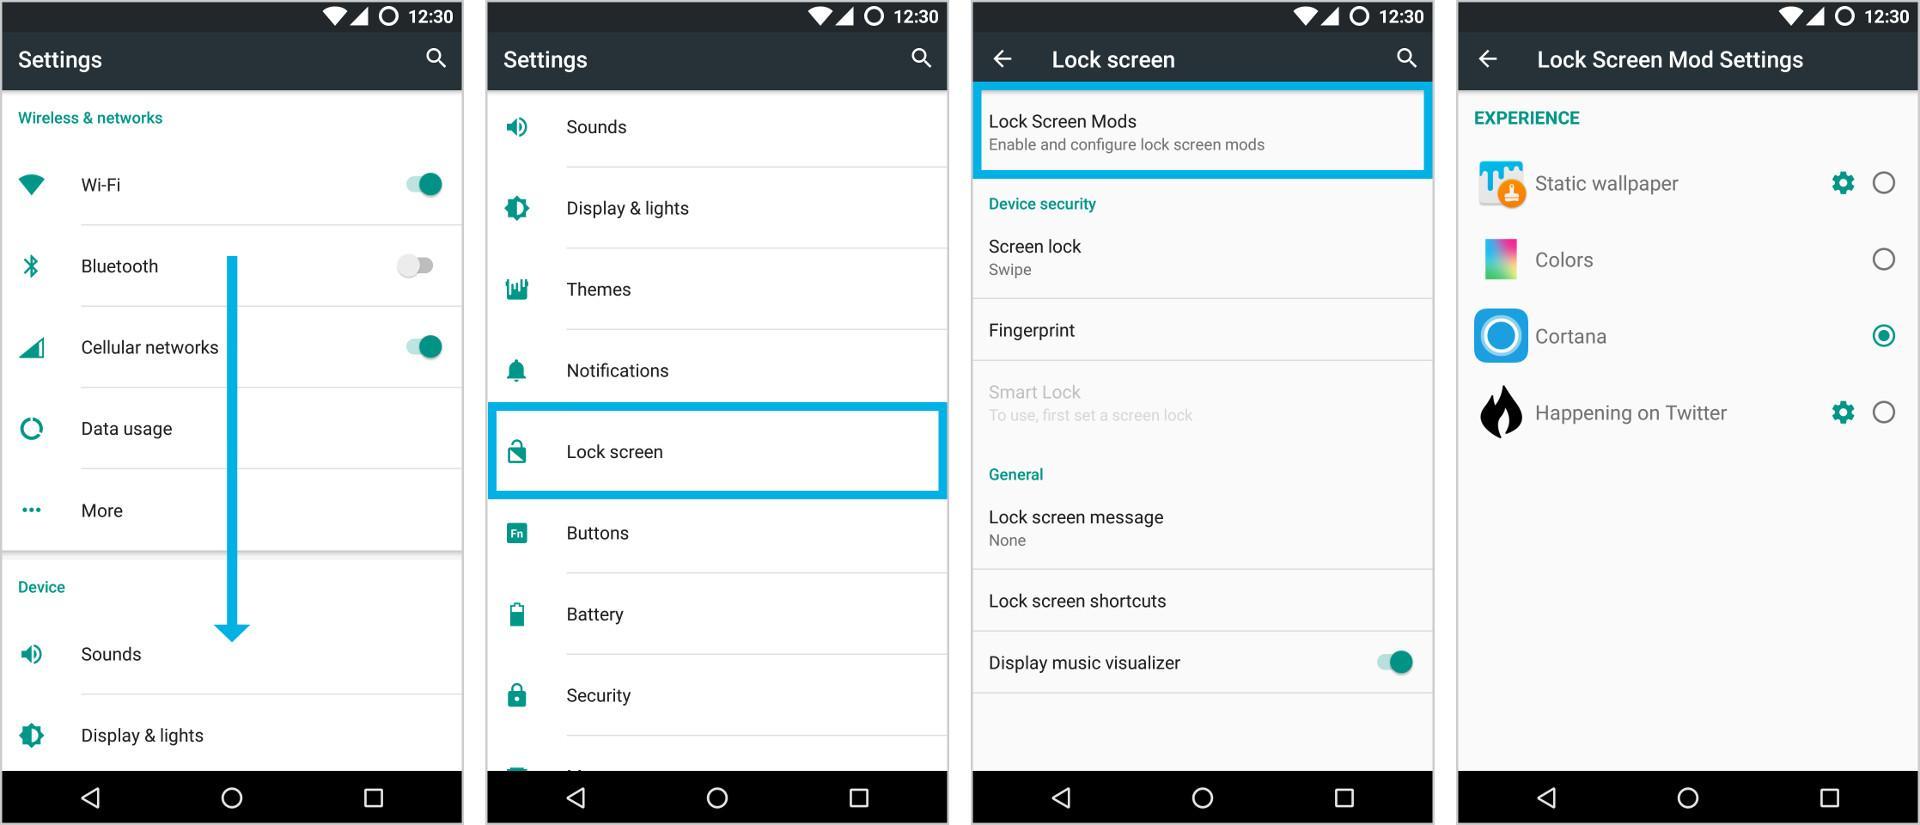 lockscreen_settings_flow_HR